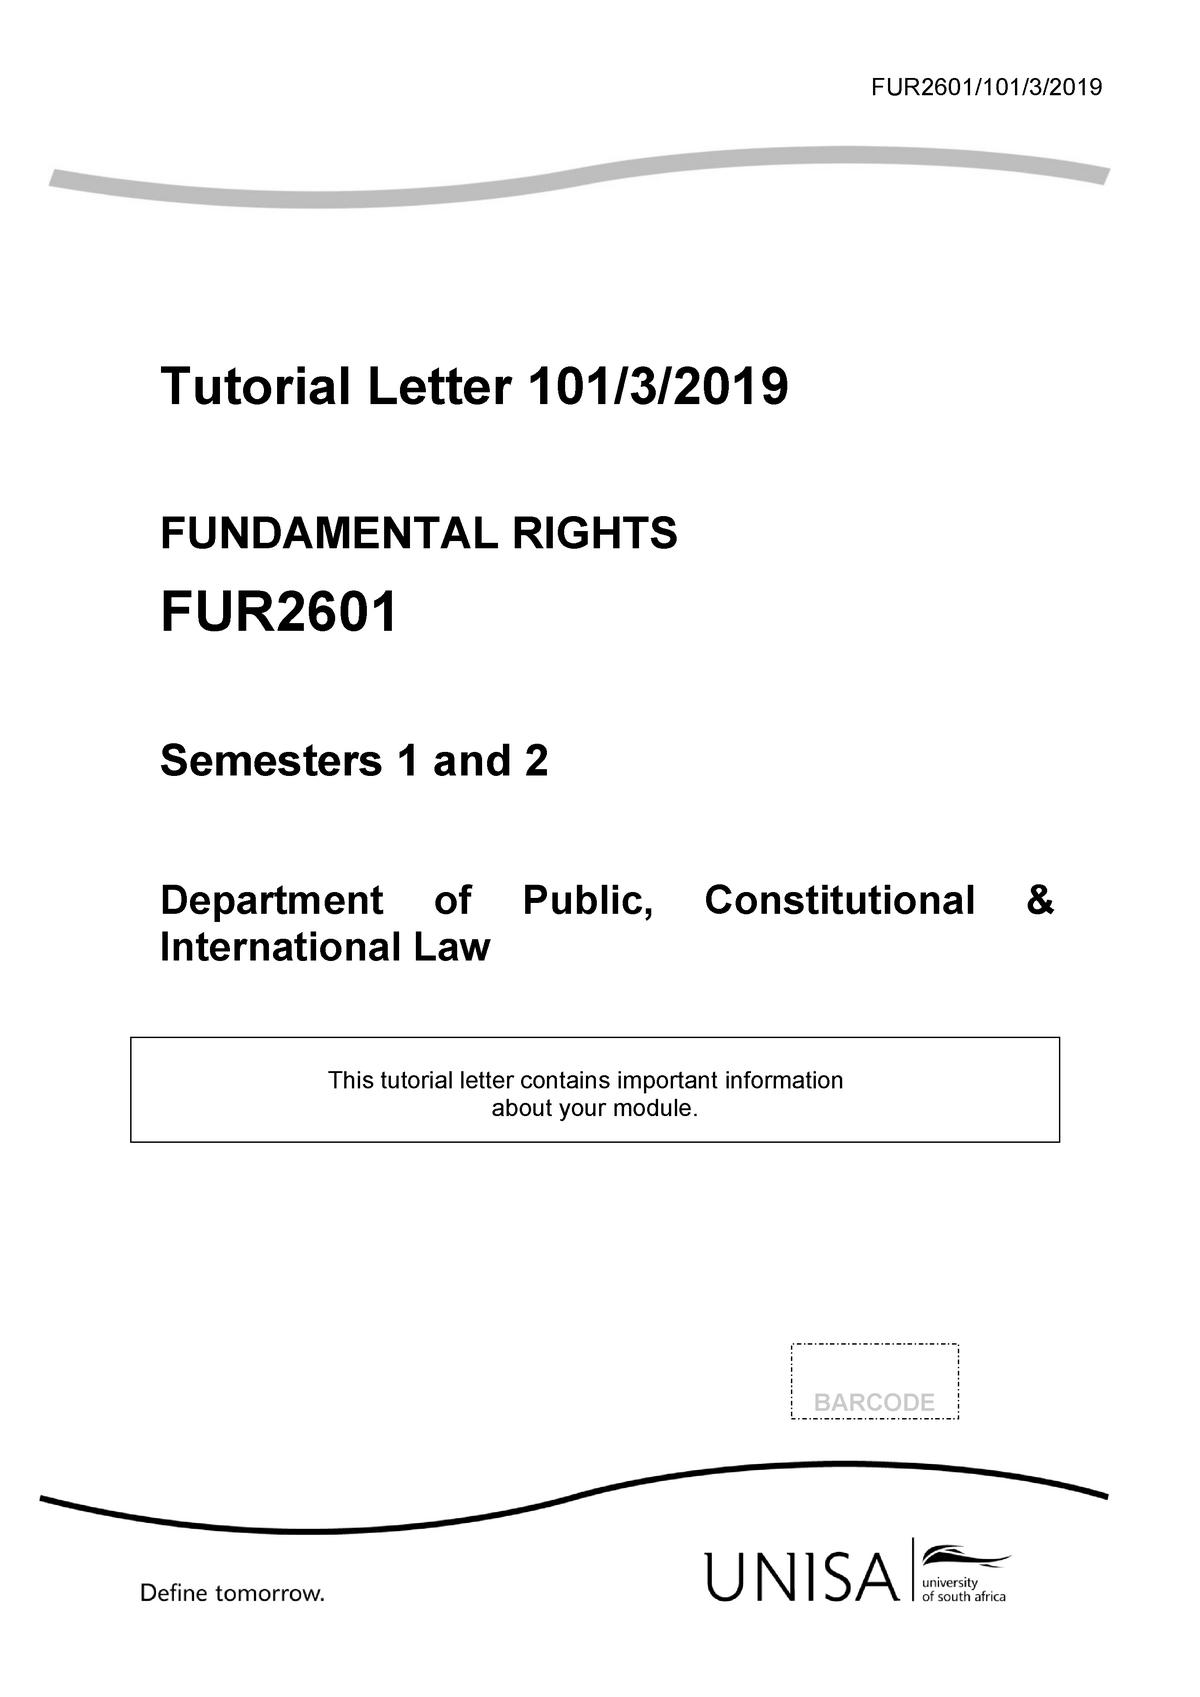 Tutorial Letter 101 2019 3 b-2 - Fundamental Rights FUR2601 ...